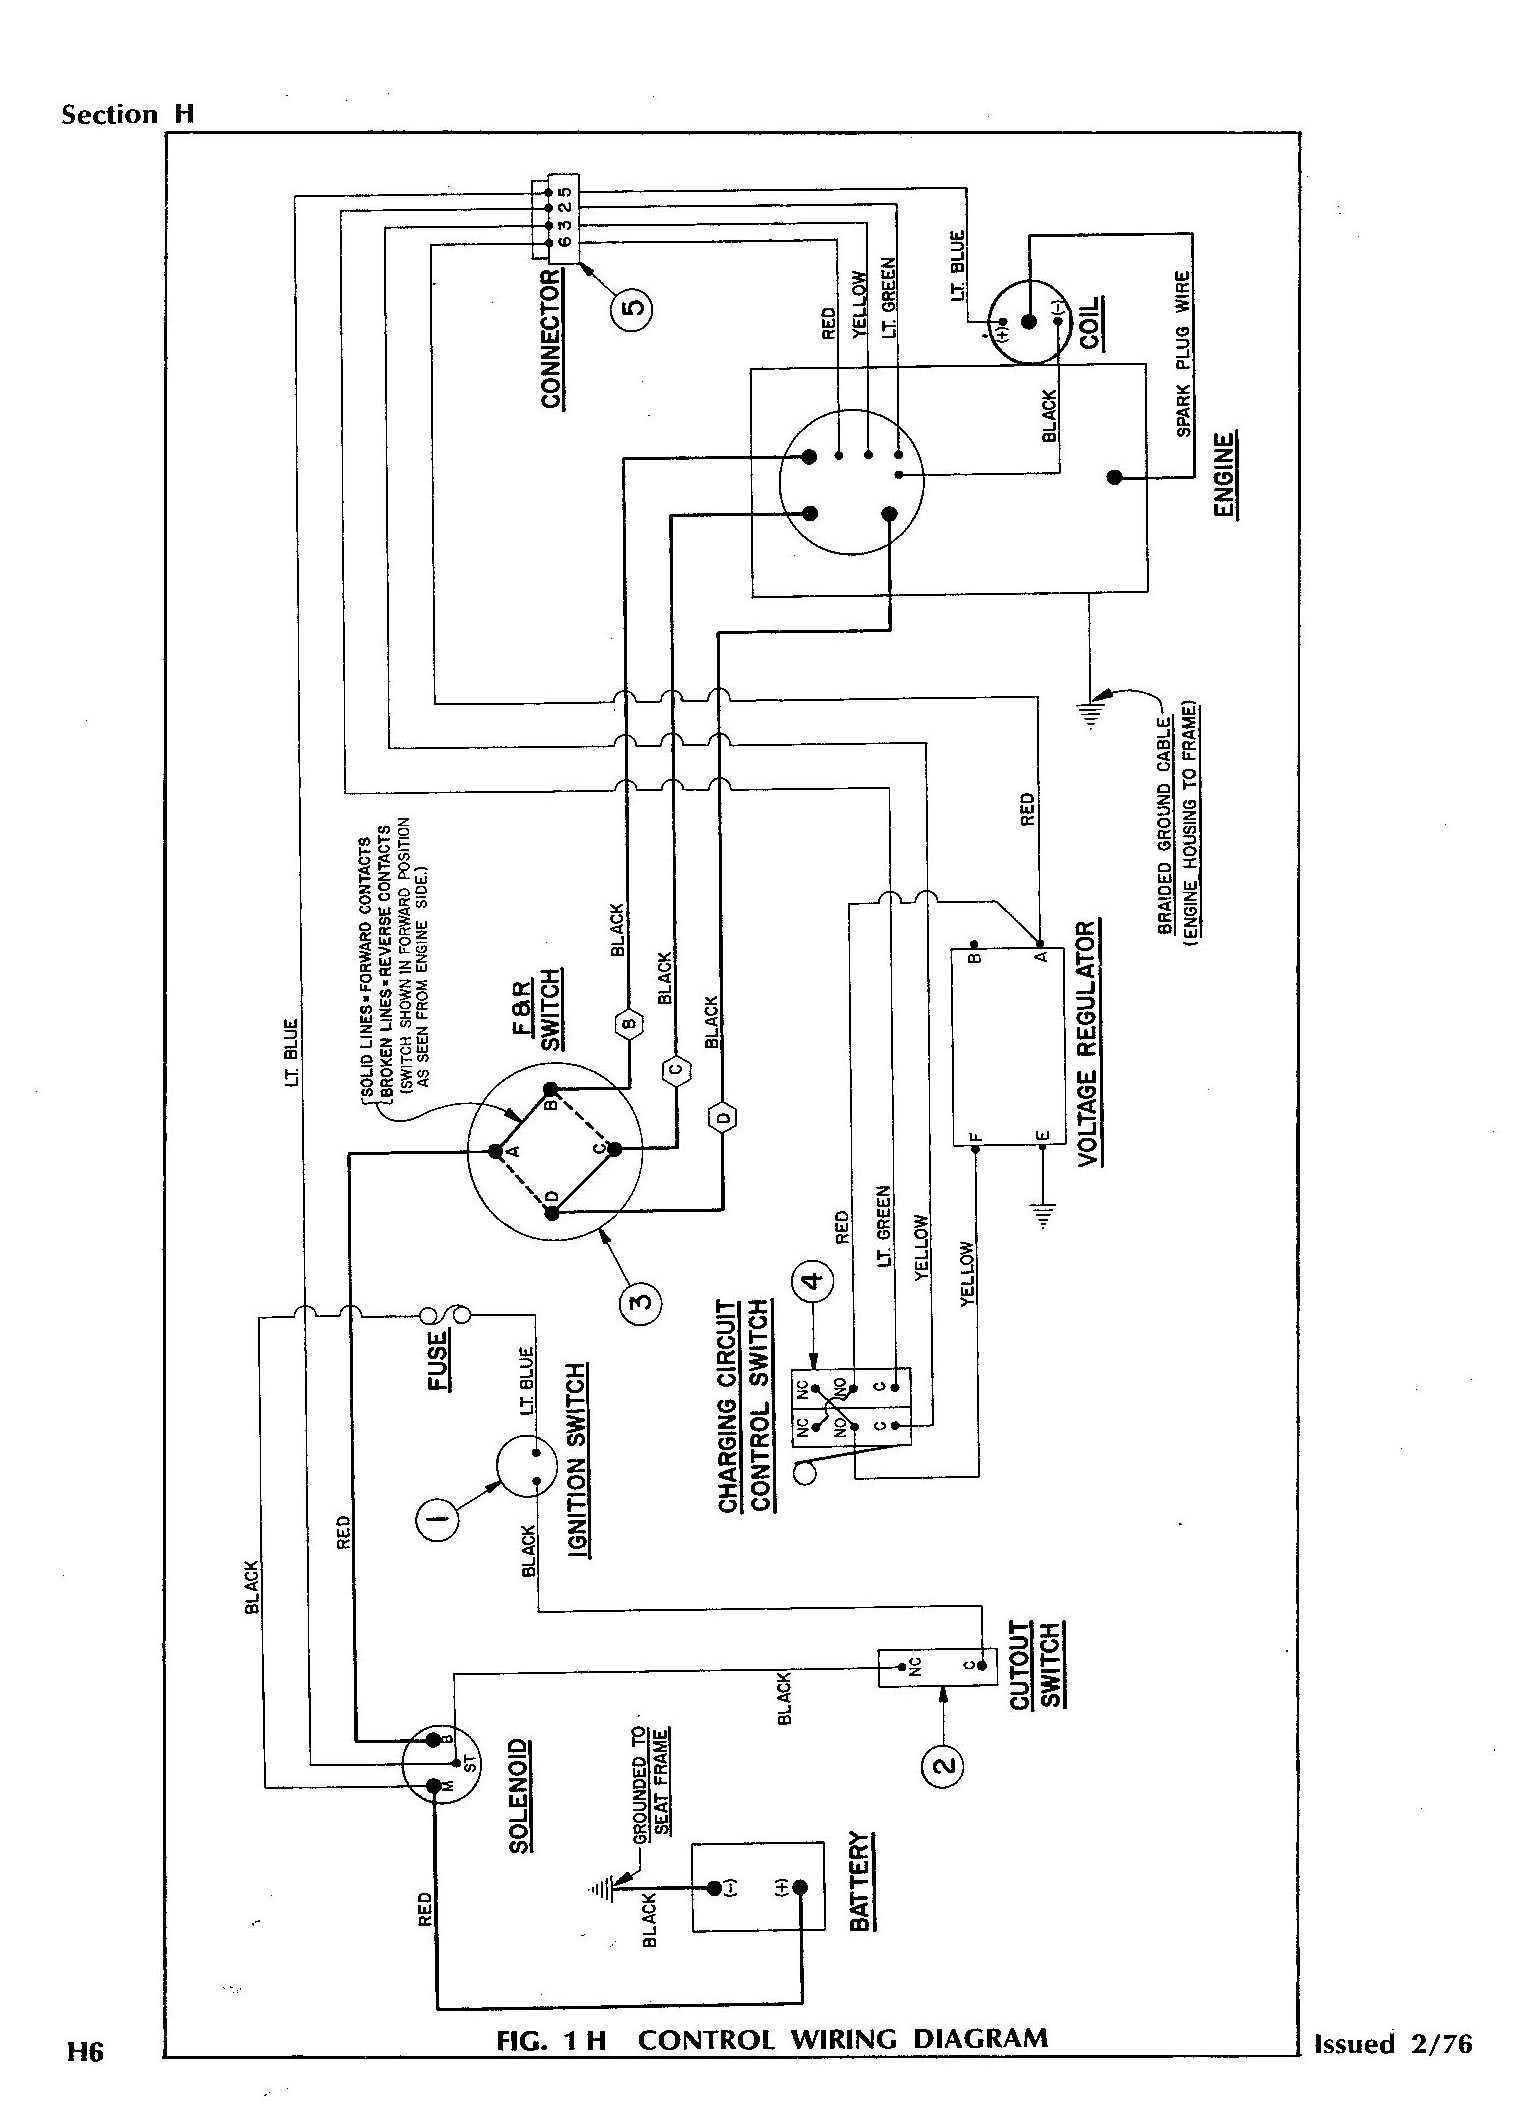 Club Car Ds Parts Diagram 1963 Harley Davidson Golf Cart Wiring Free Download Of